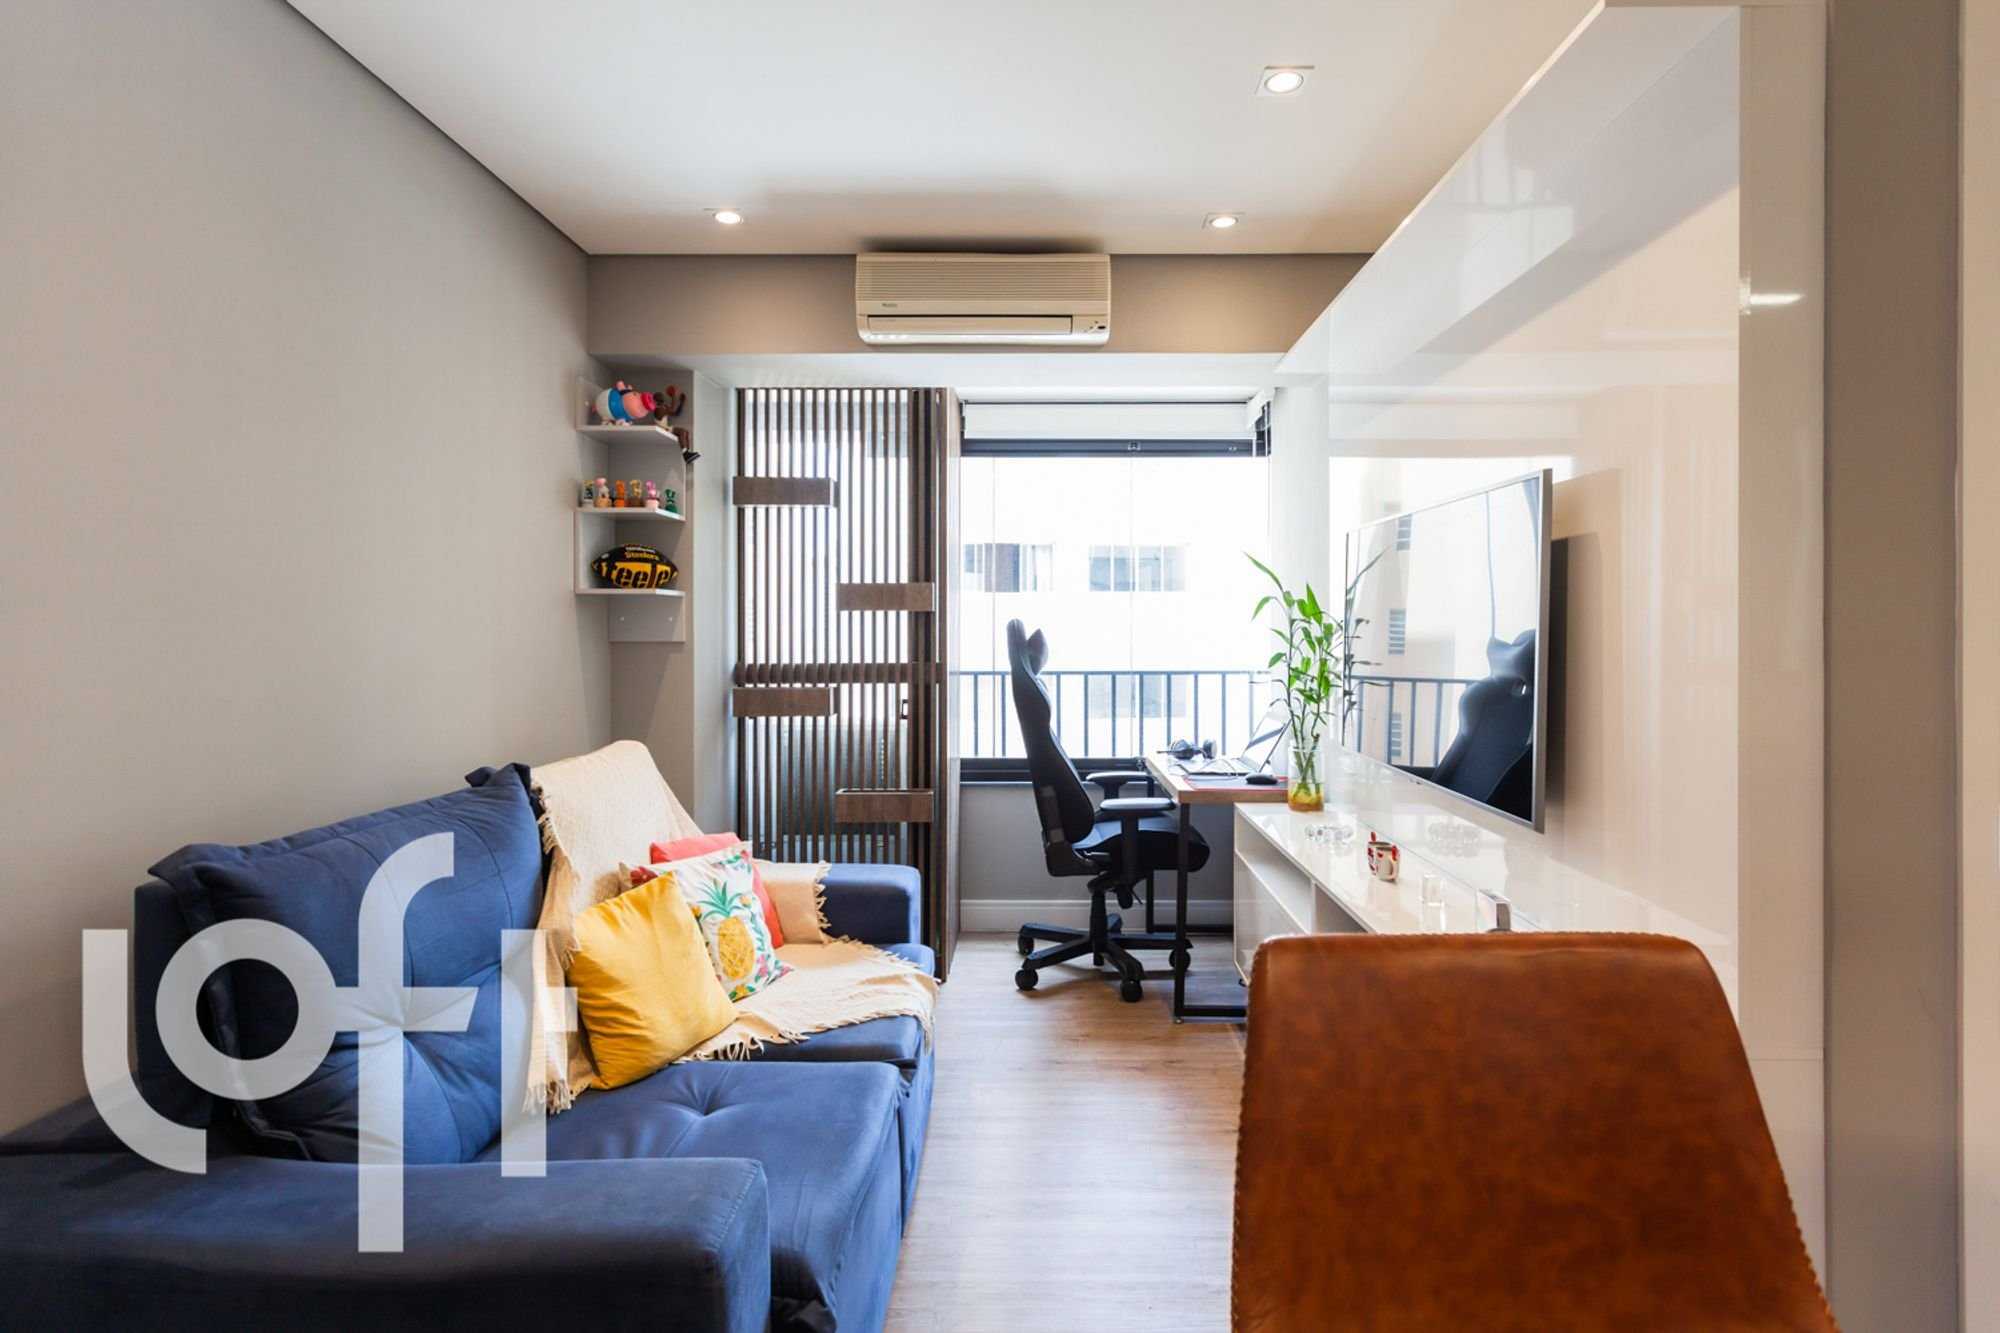 Foto de Sala com vaso de planta, sofá, vaso, cadeira, livro